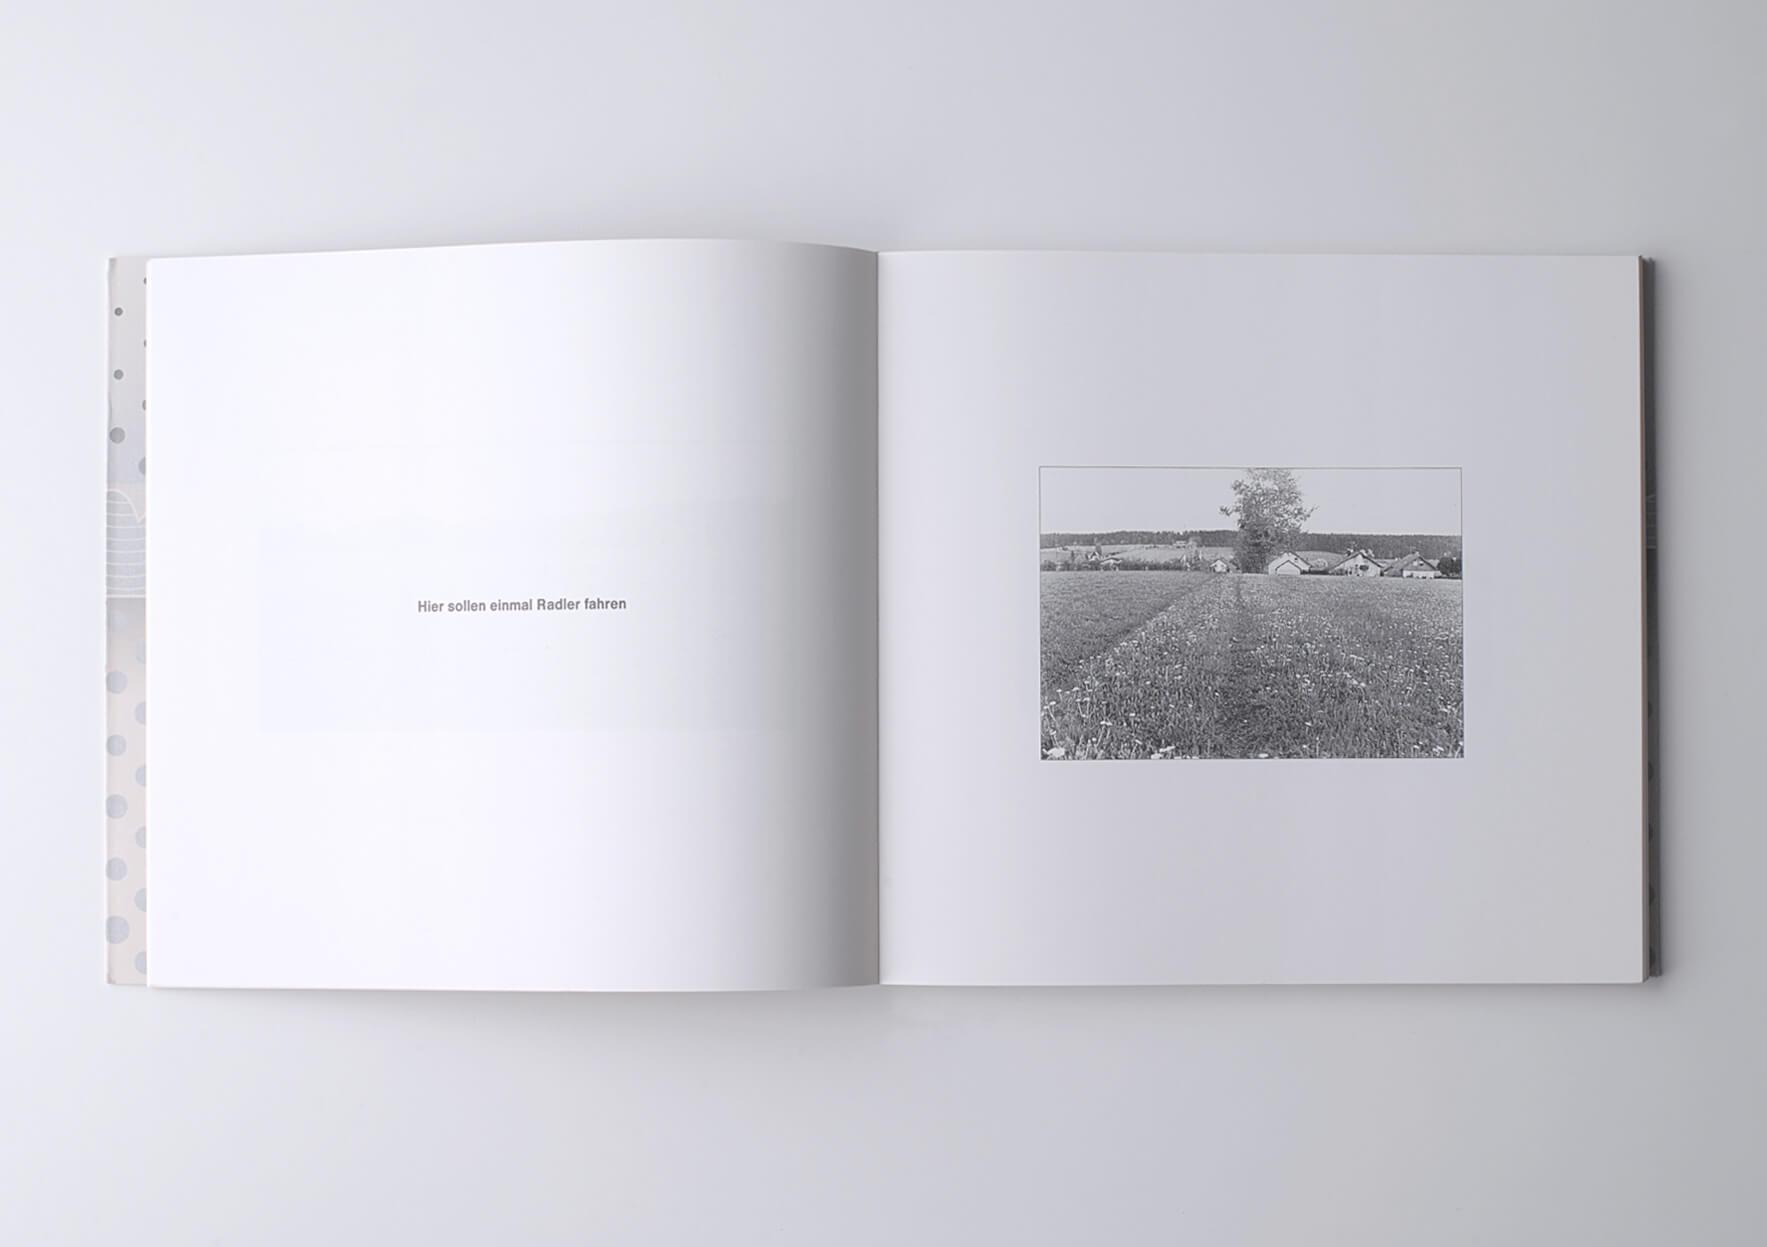 PETER PILLER. Noch ist nichts zu sehen, 1998 | Accrochage #3: Footnote nº 10 | ProjecteSD